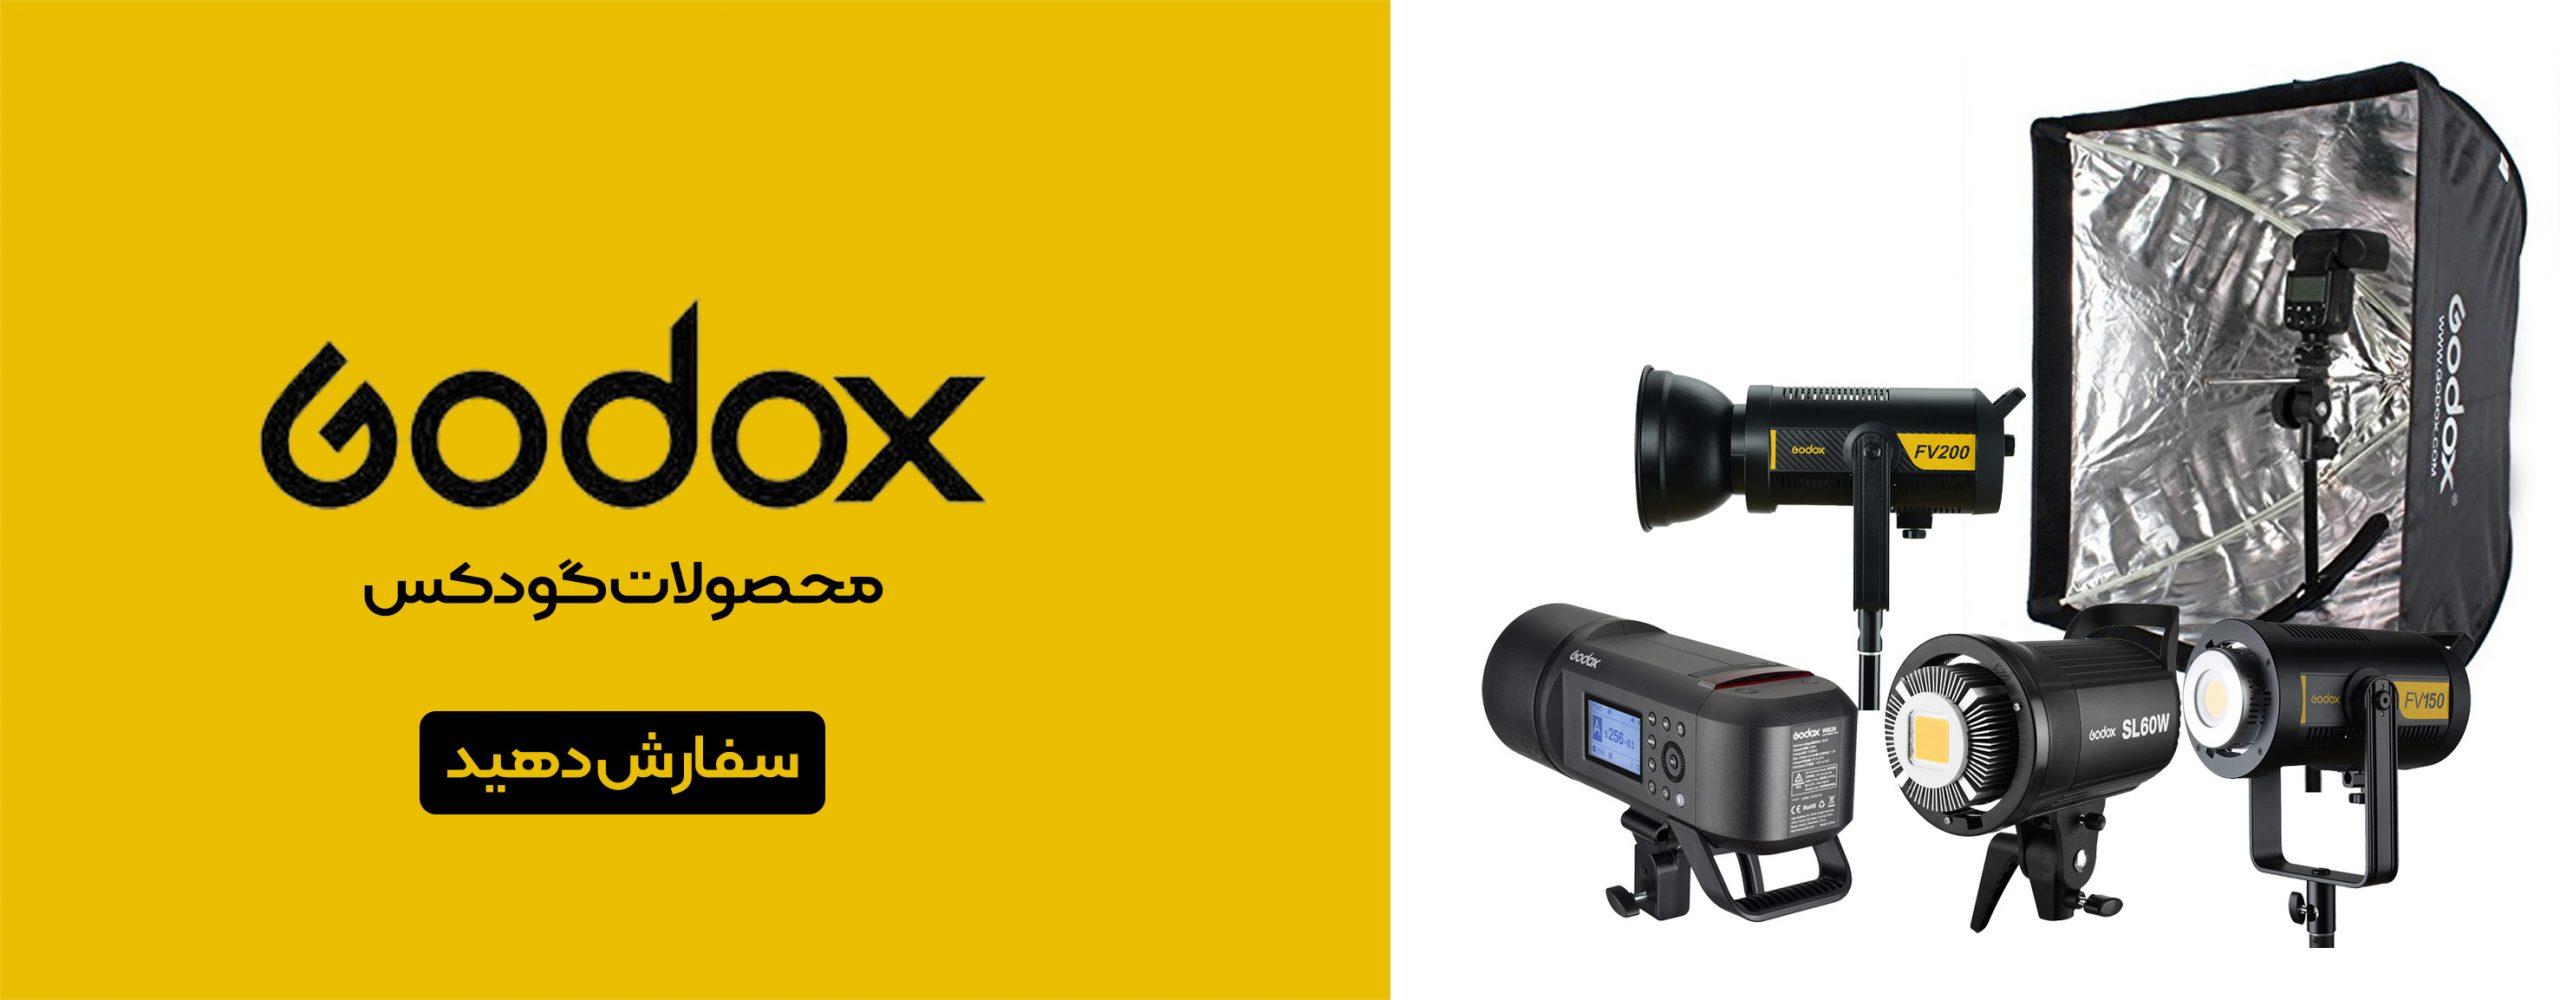 godox product